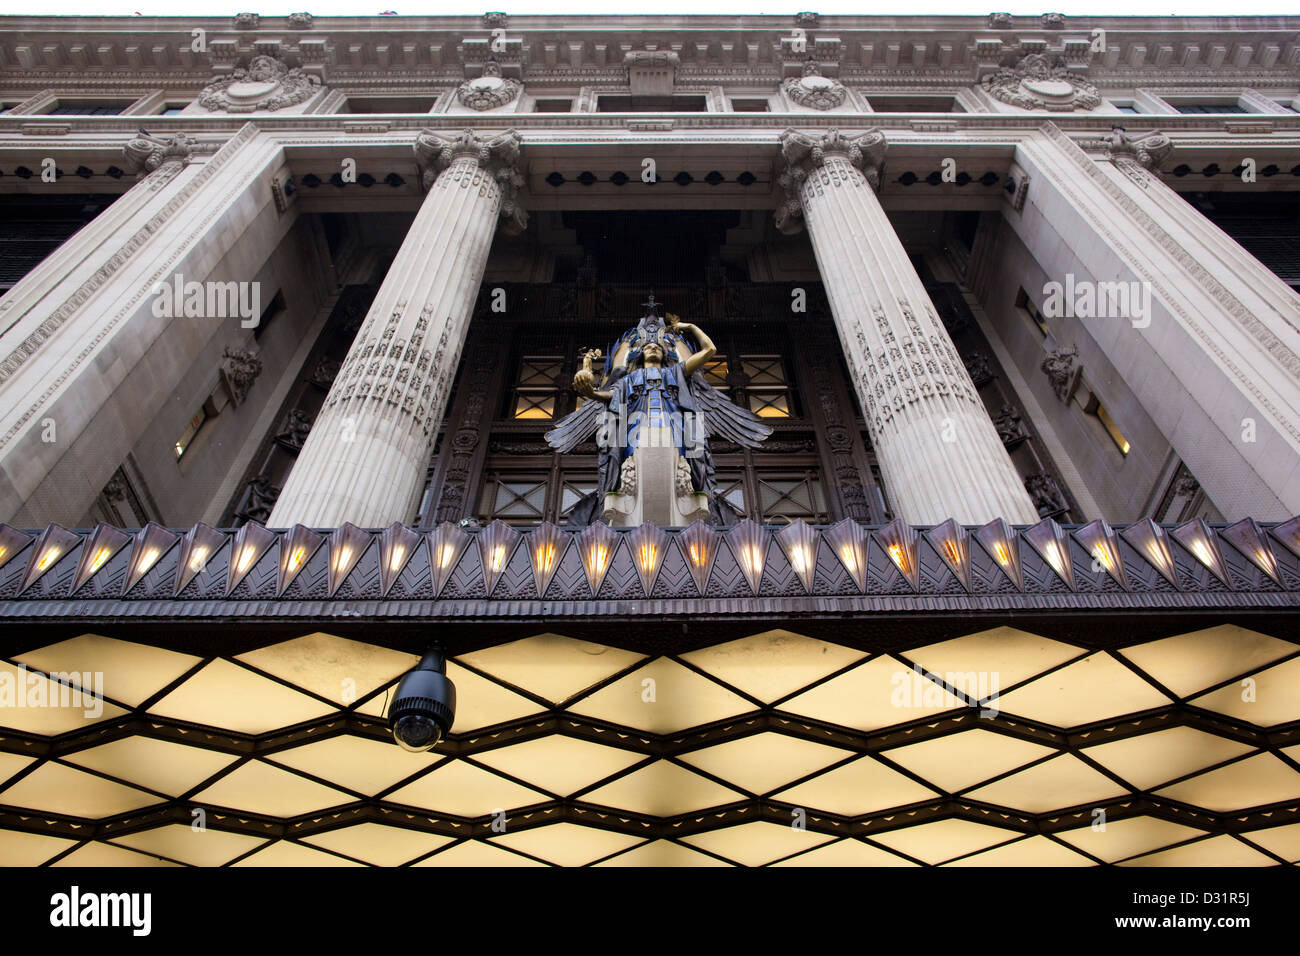 Selfridge & Co (Selfridges) high end department store founded by Harry Gordon Selfridge in 1909, Oxford Street - Stock Image